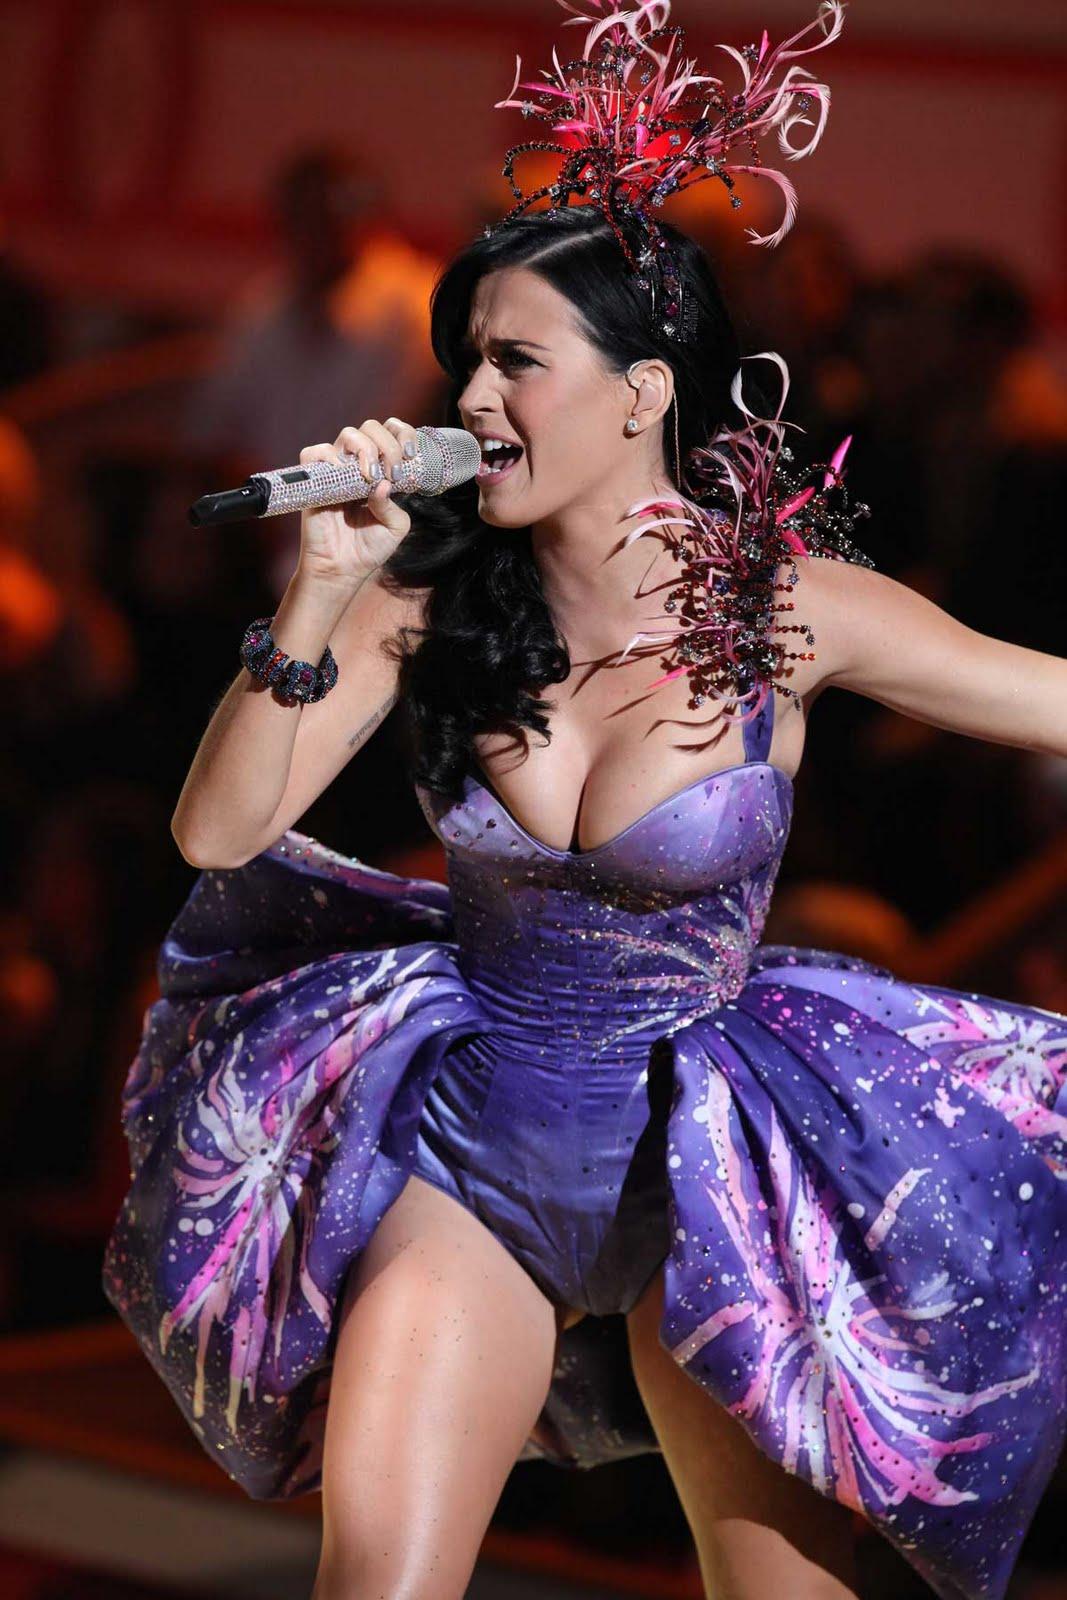 http://2.bp.blogspot.com/_R78pg7TjfIY/TOauYojhFSI/AAAAAAAAF_g/az3Sk8Vh3-c/s1600/Katy-Perry-Victorias-Secret-Fashion-Show-01.jpg